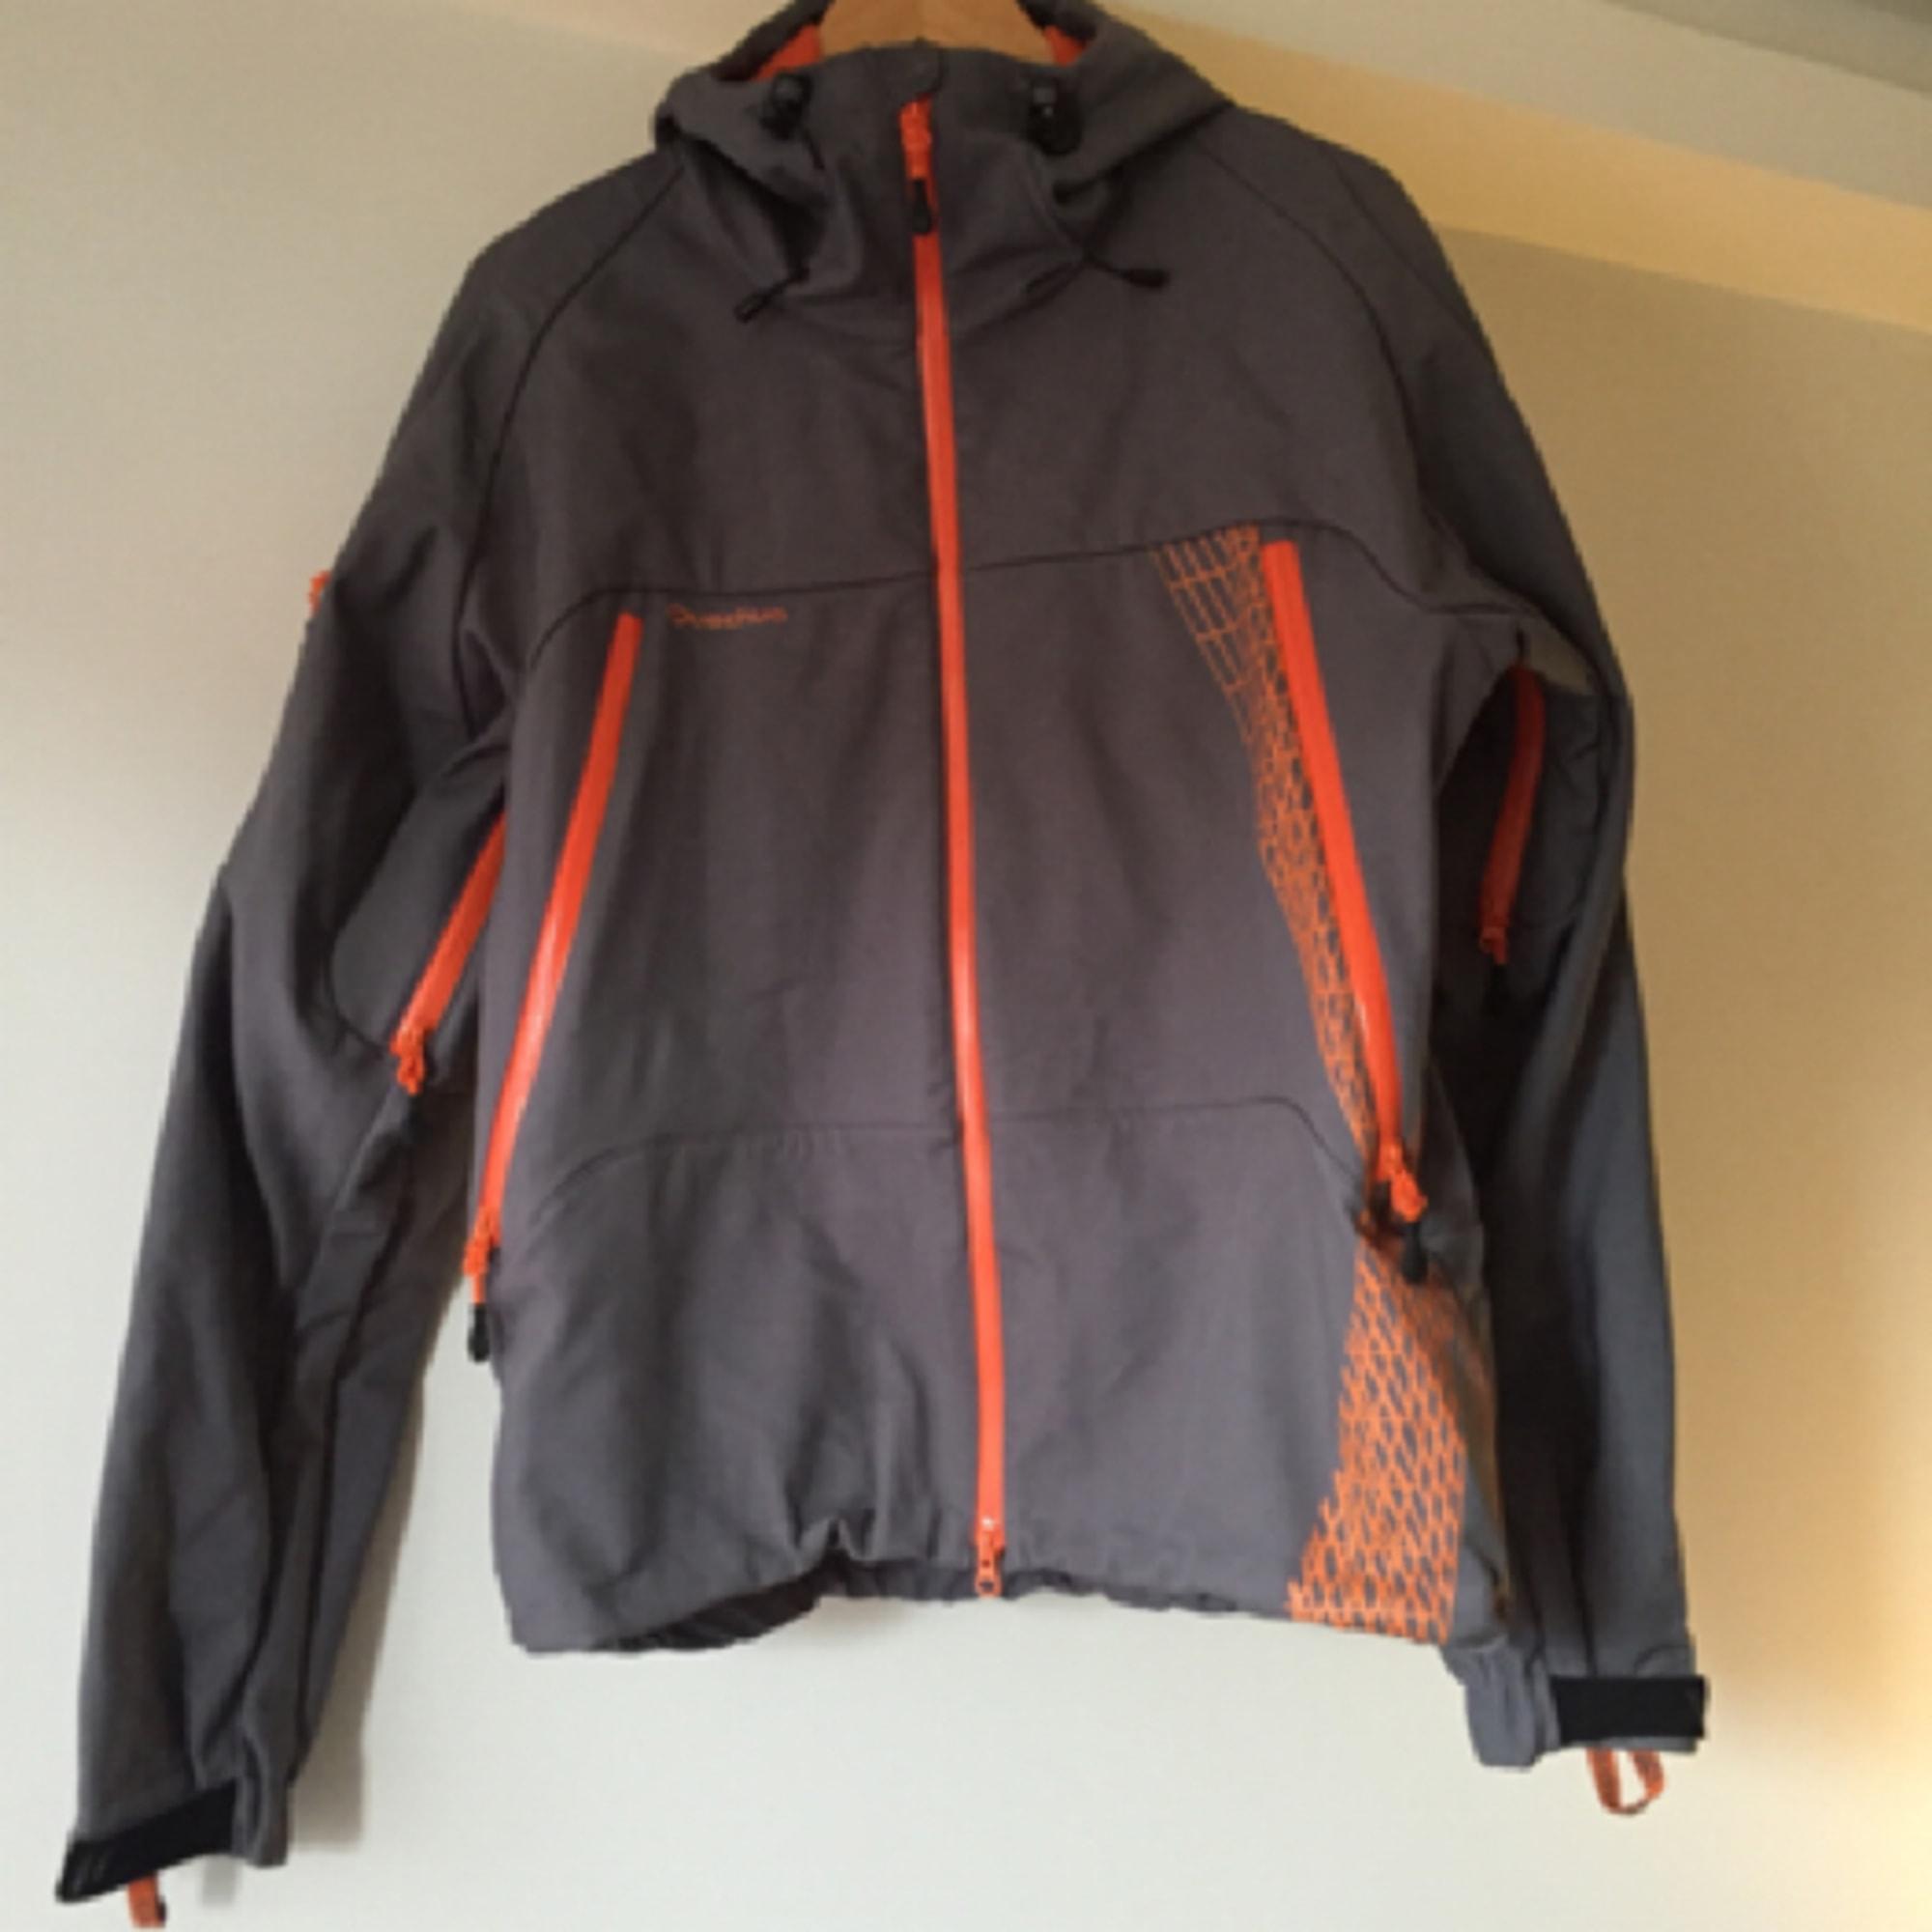 hot products sells factory price Blouson de ski